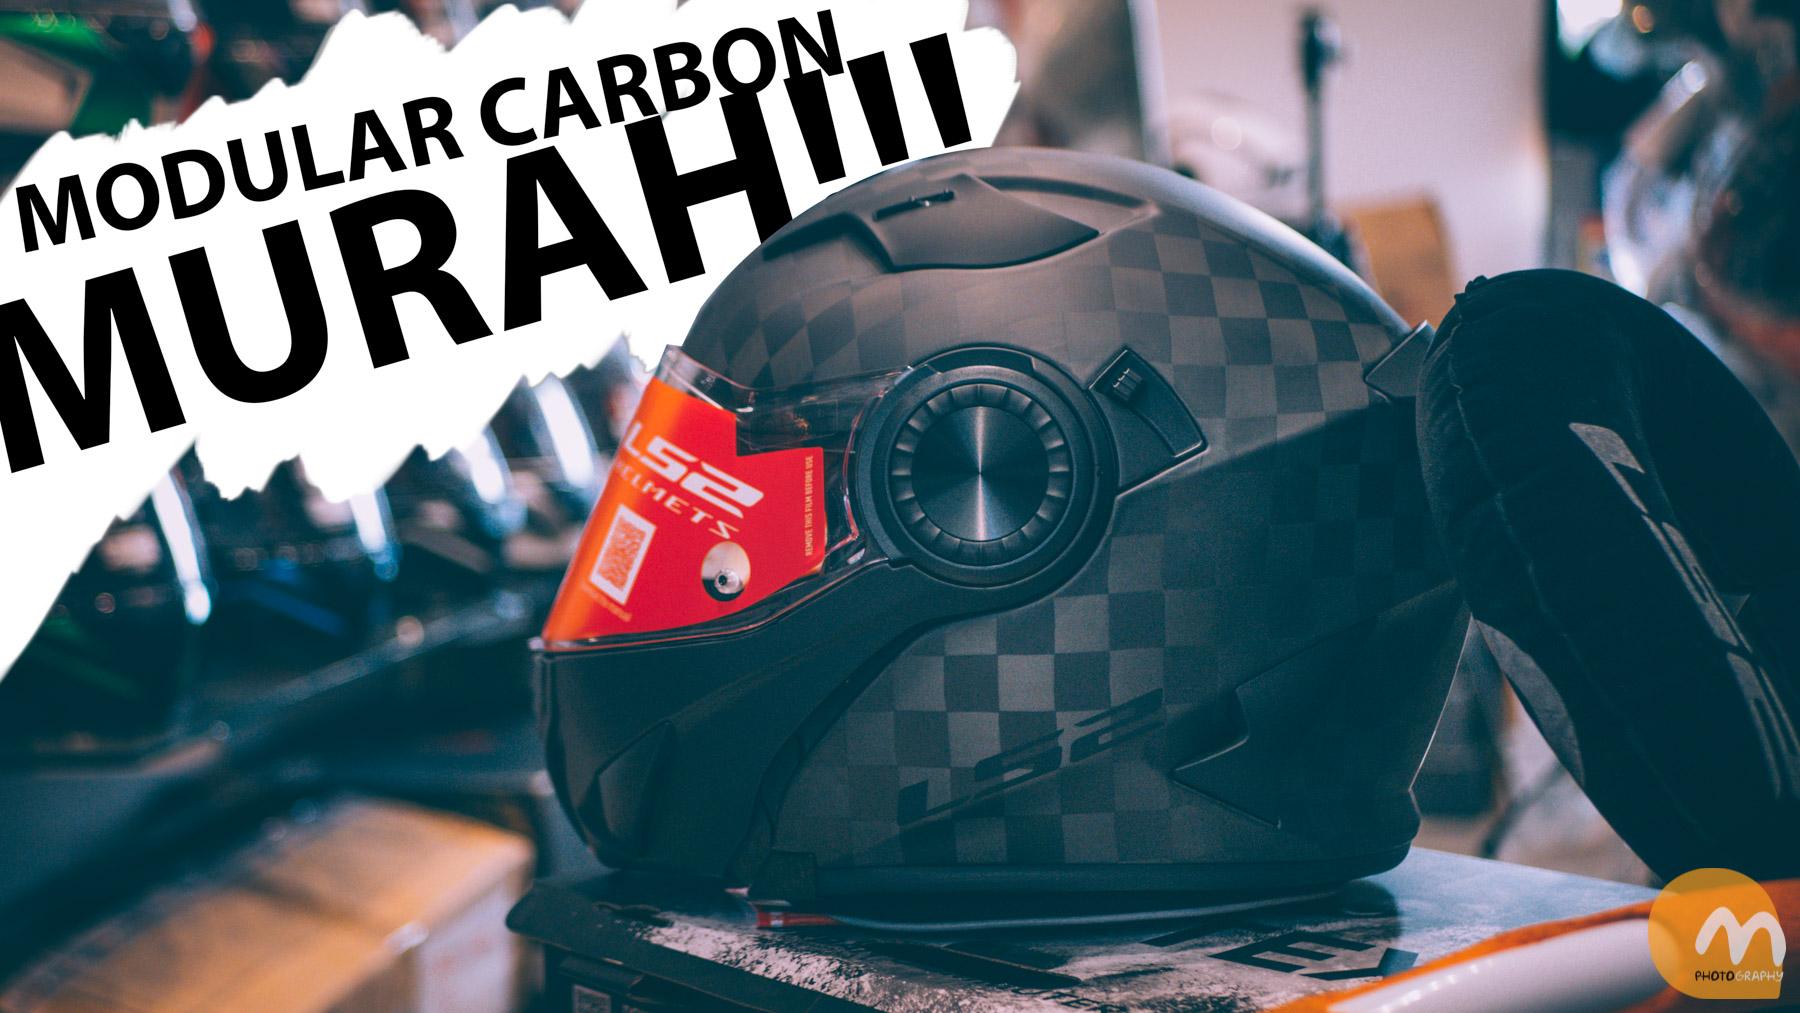 Helm Carbon Modular Murah dari LS2, LS2 Vortex